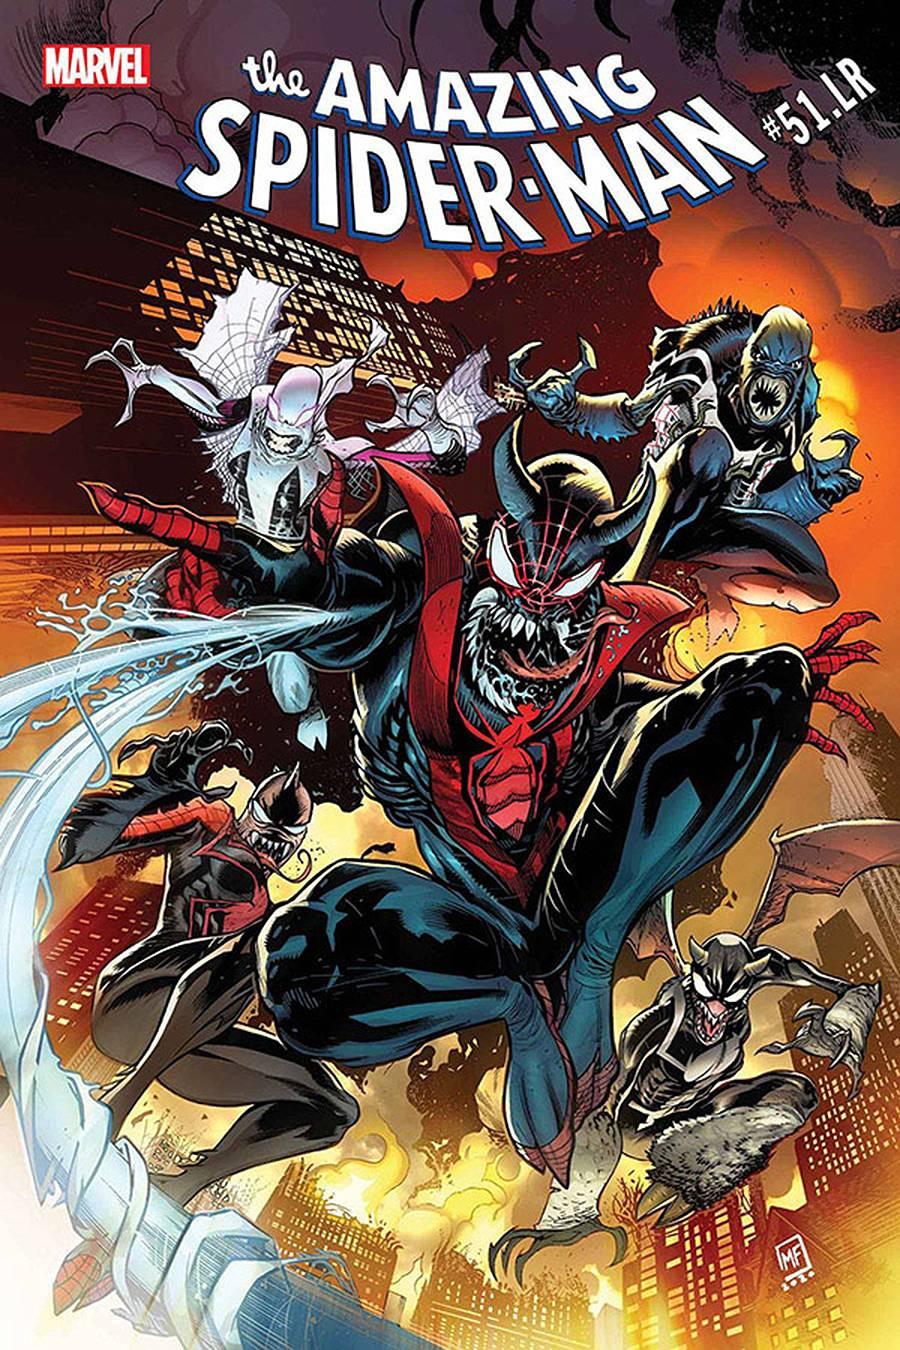 AMAZING SPIDER-MAN #51.LR SPENCER SGN